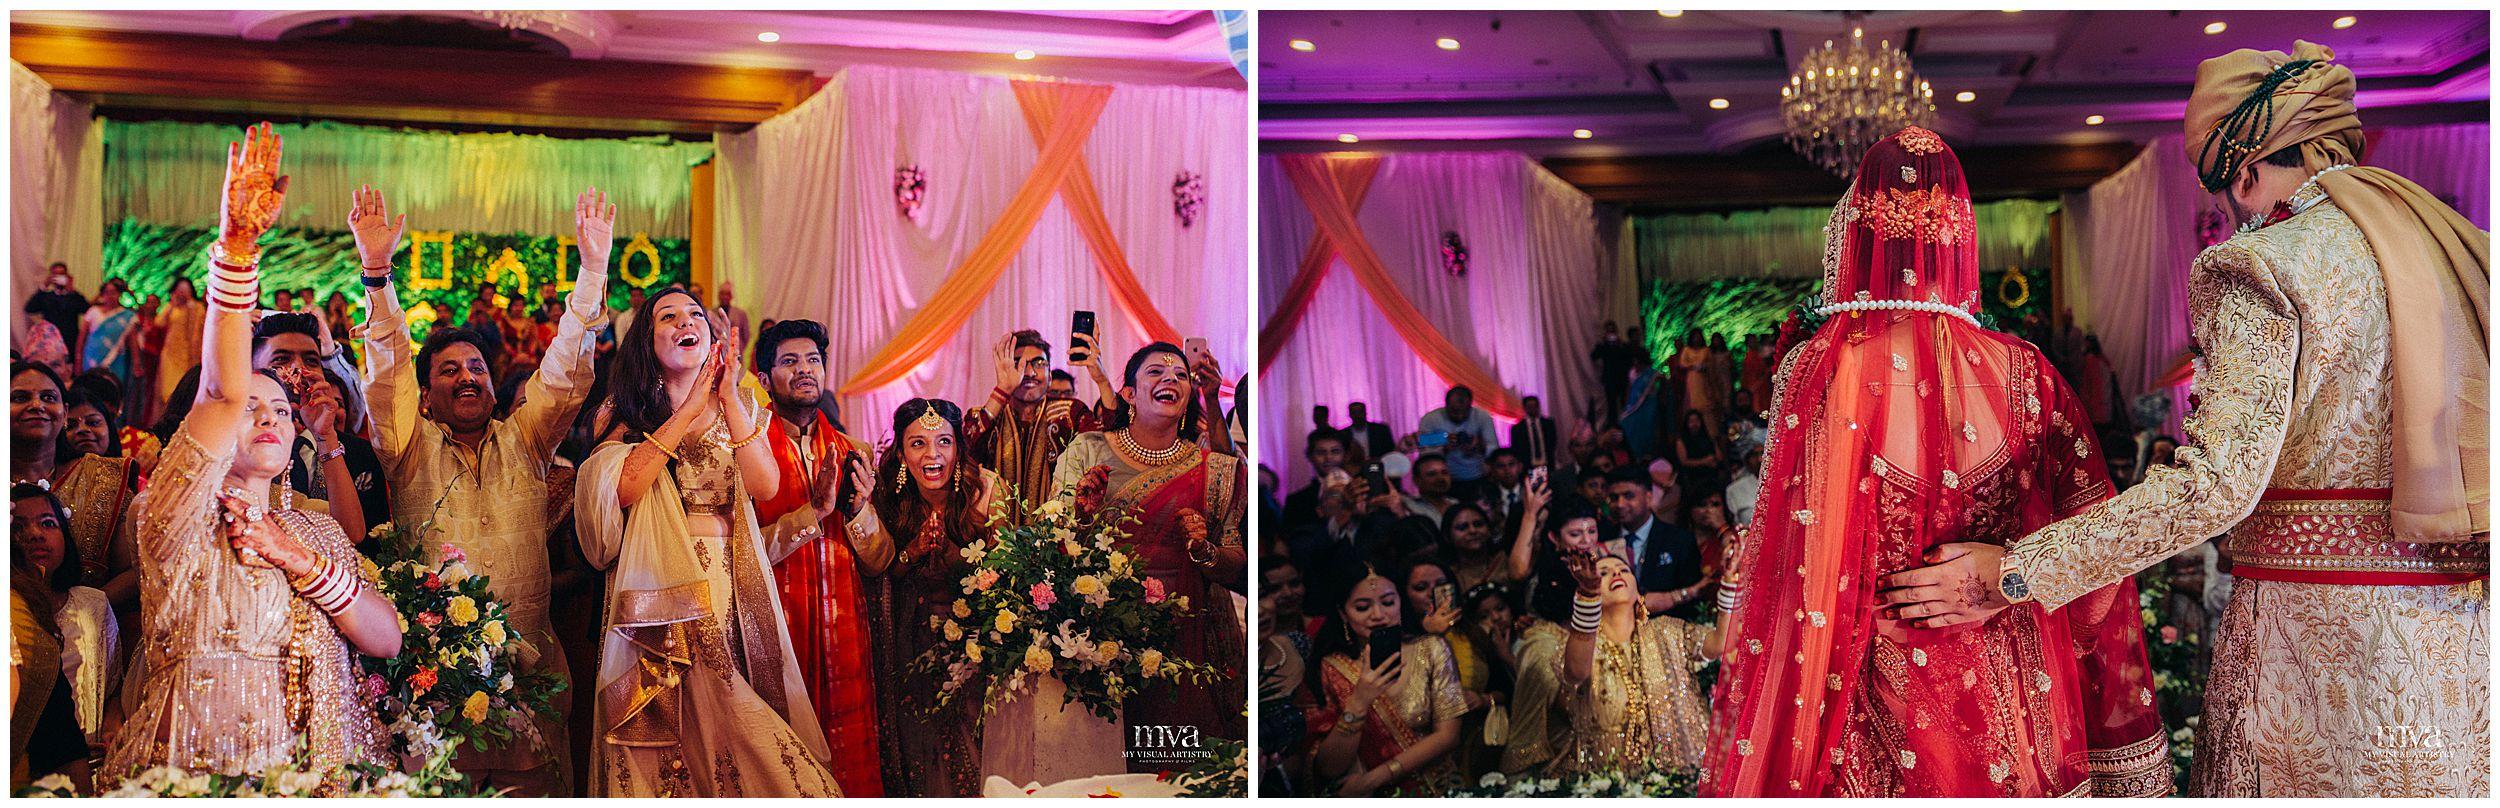 SONAAL_AMI_MYVISUALARTISTRY_WEDDING_PHOTOGRAPHY_MVA_NEPAL_KATHMANDU_SOALTEE76.jpg